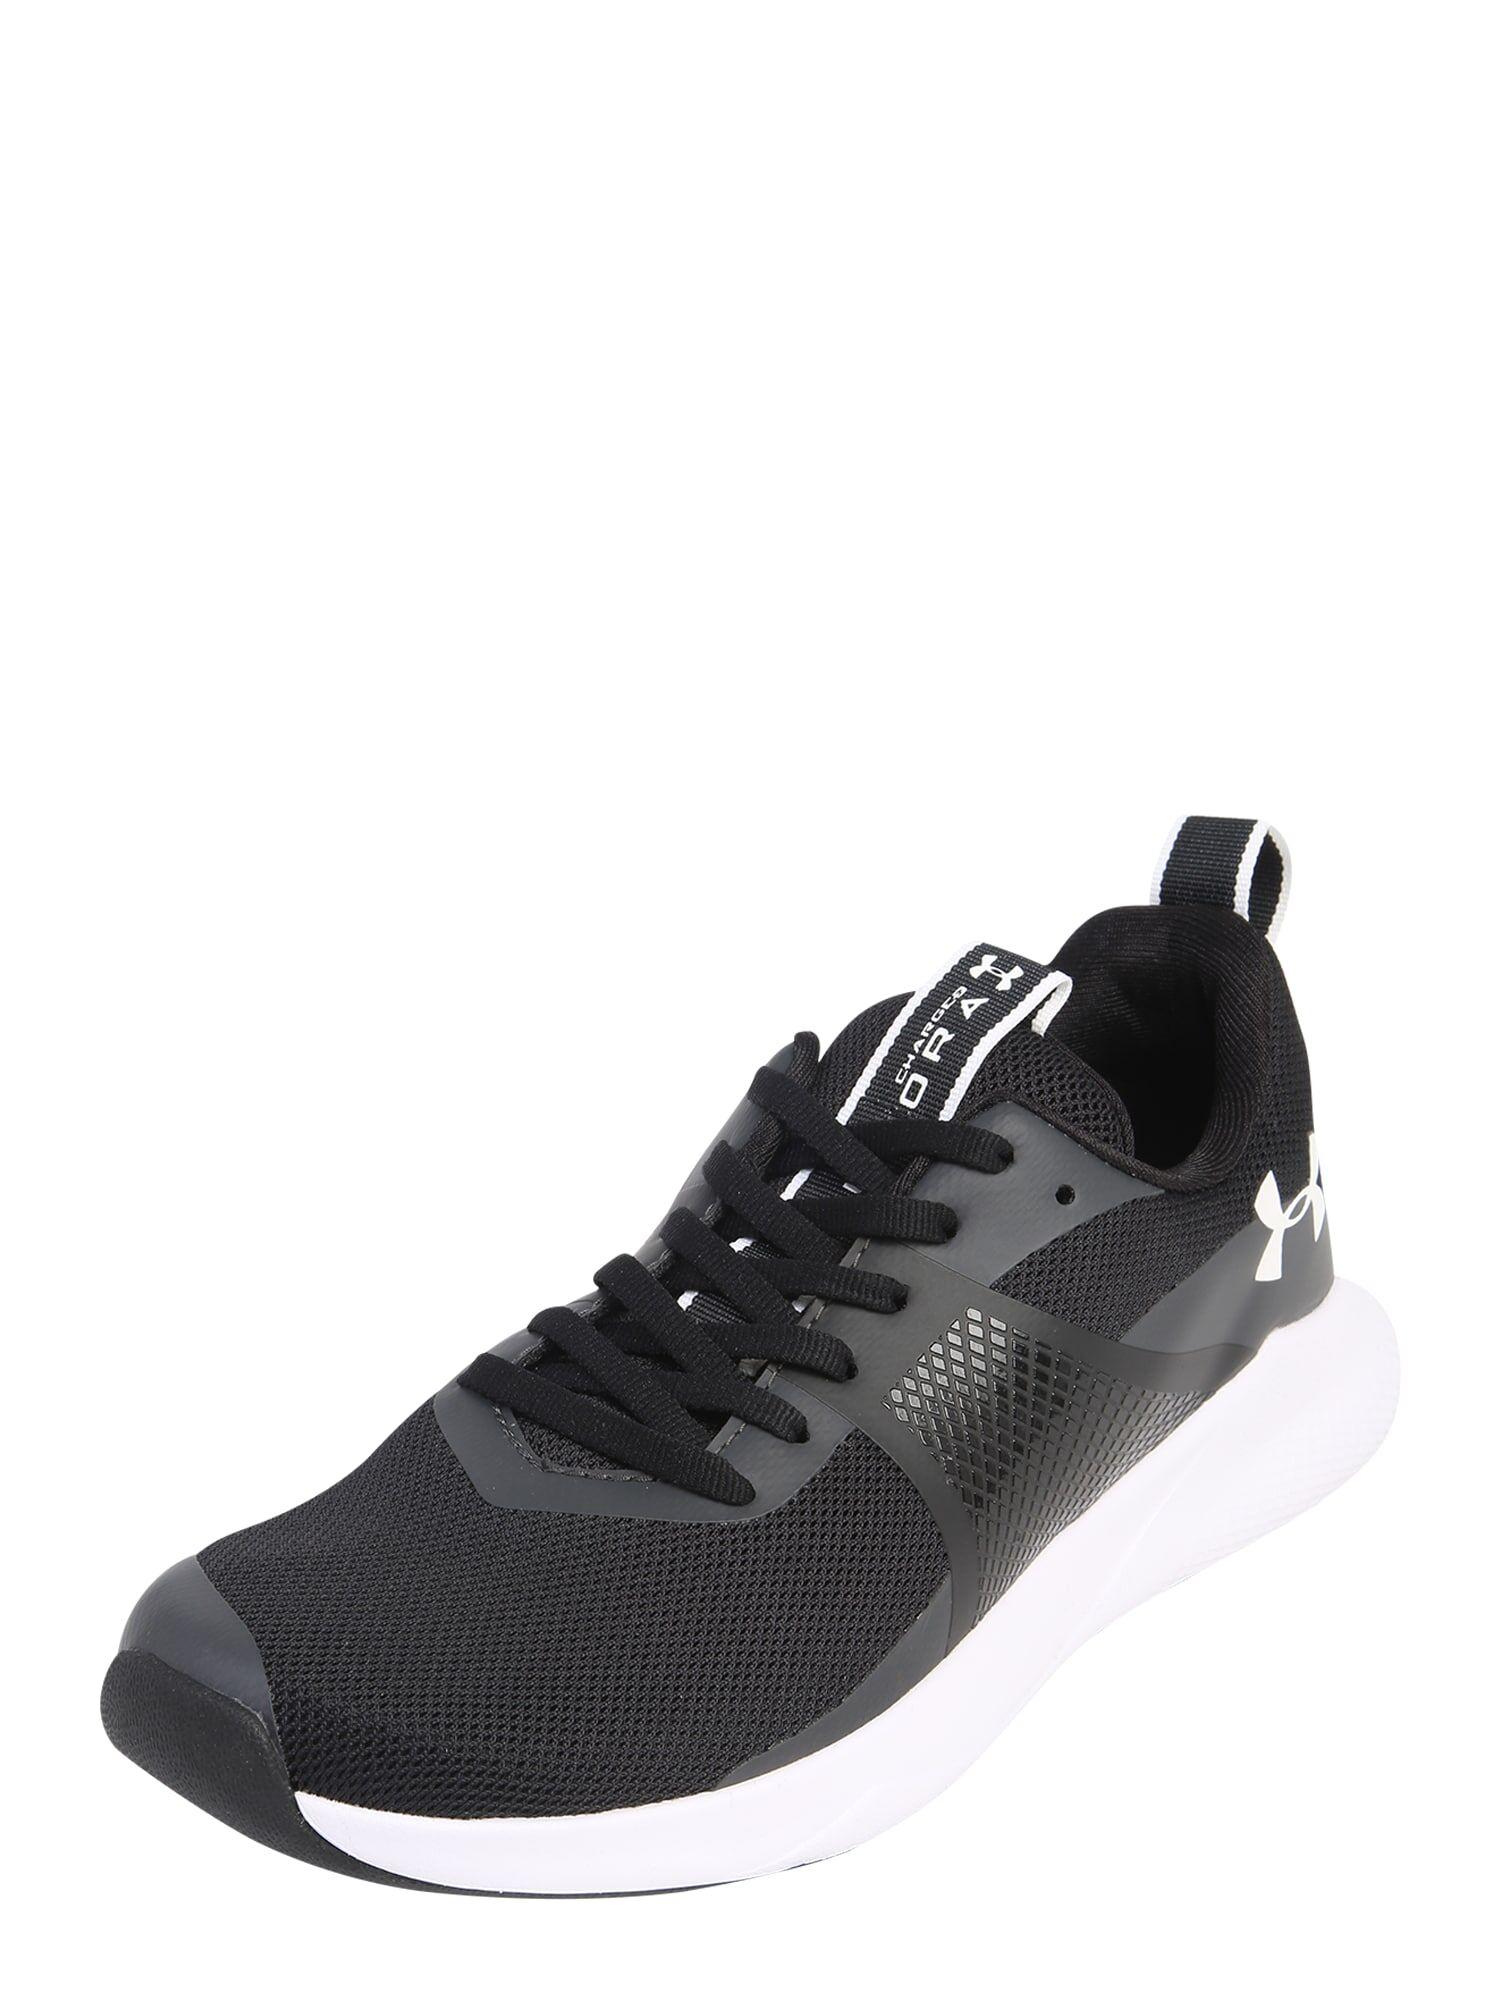 UNDER ARMOUR Chaussure de sport 'Aurora'  - Noir - Taille: 8.5 - female